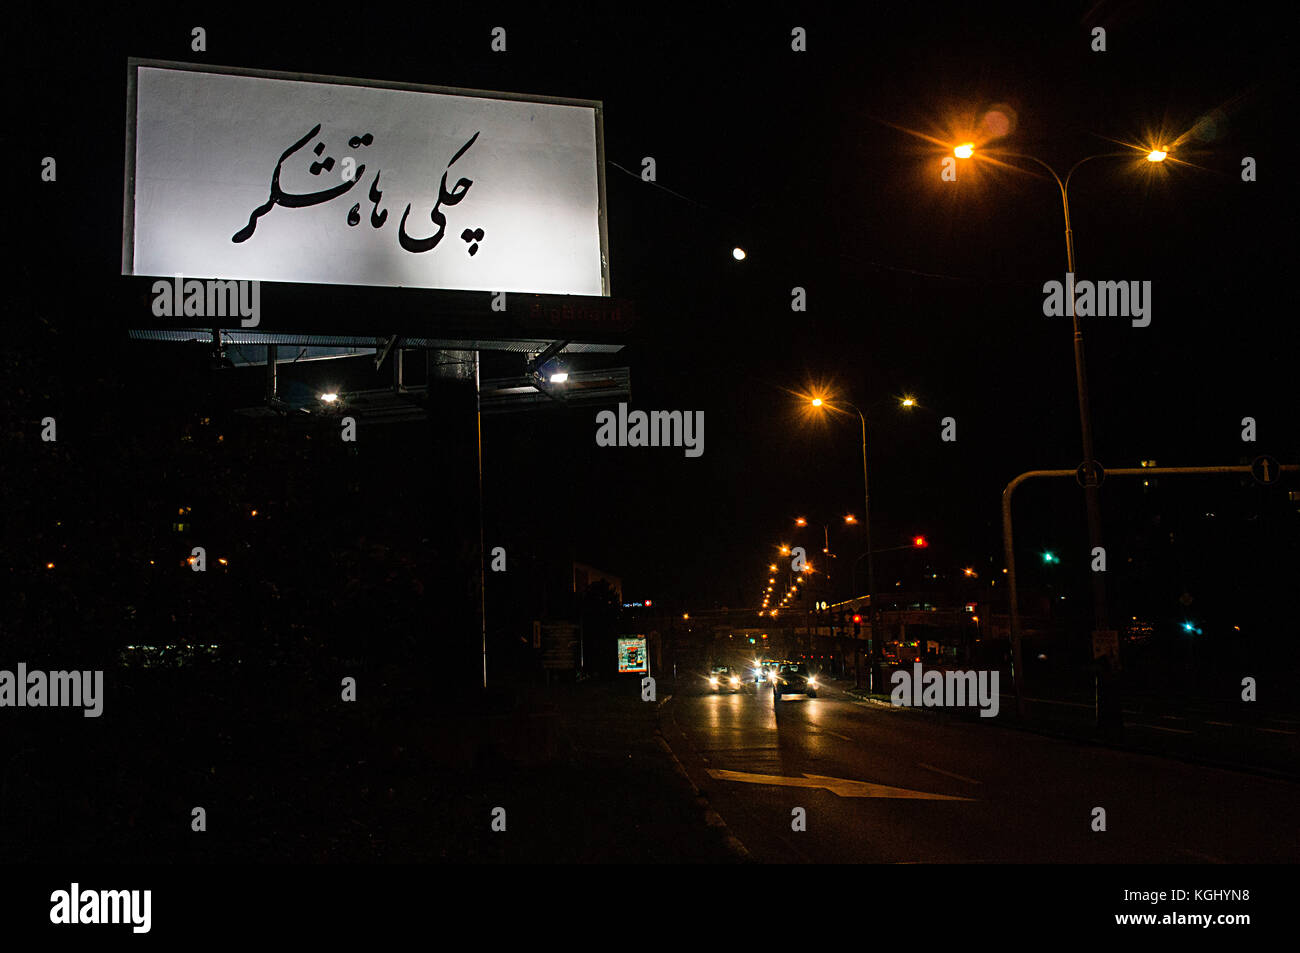 billboard, advert, advertisement, campaign, People In Need